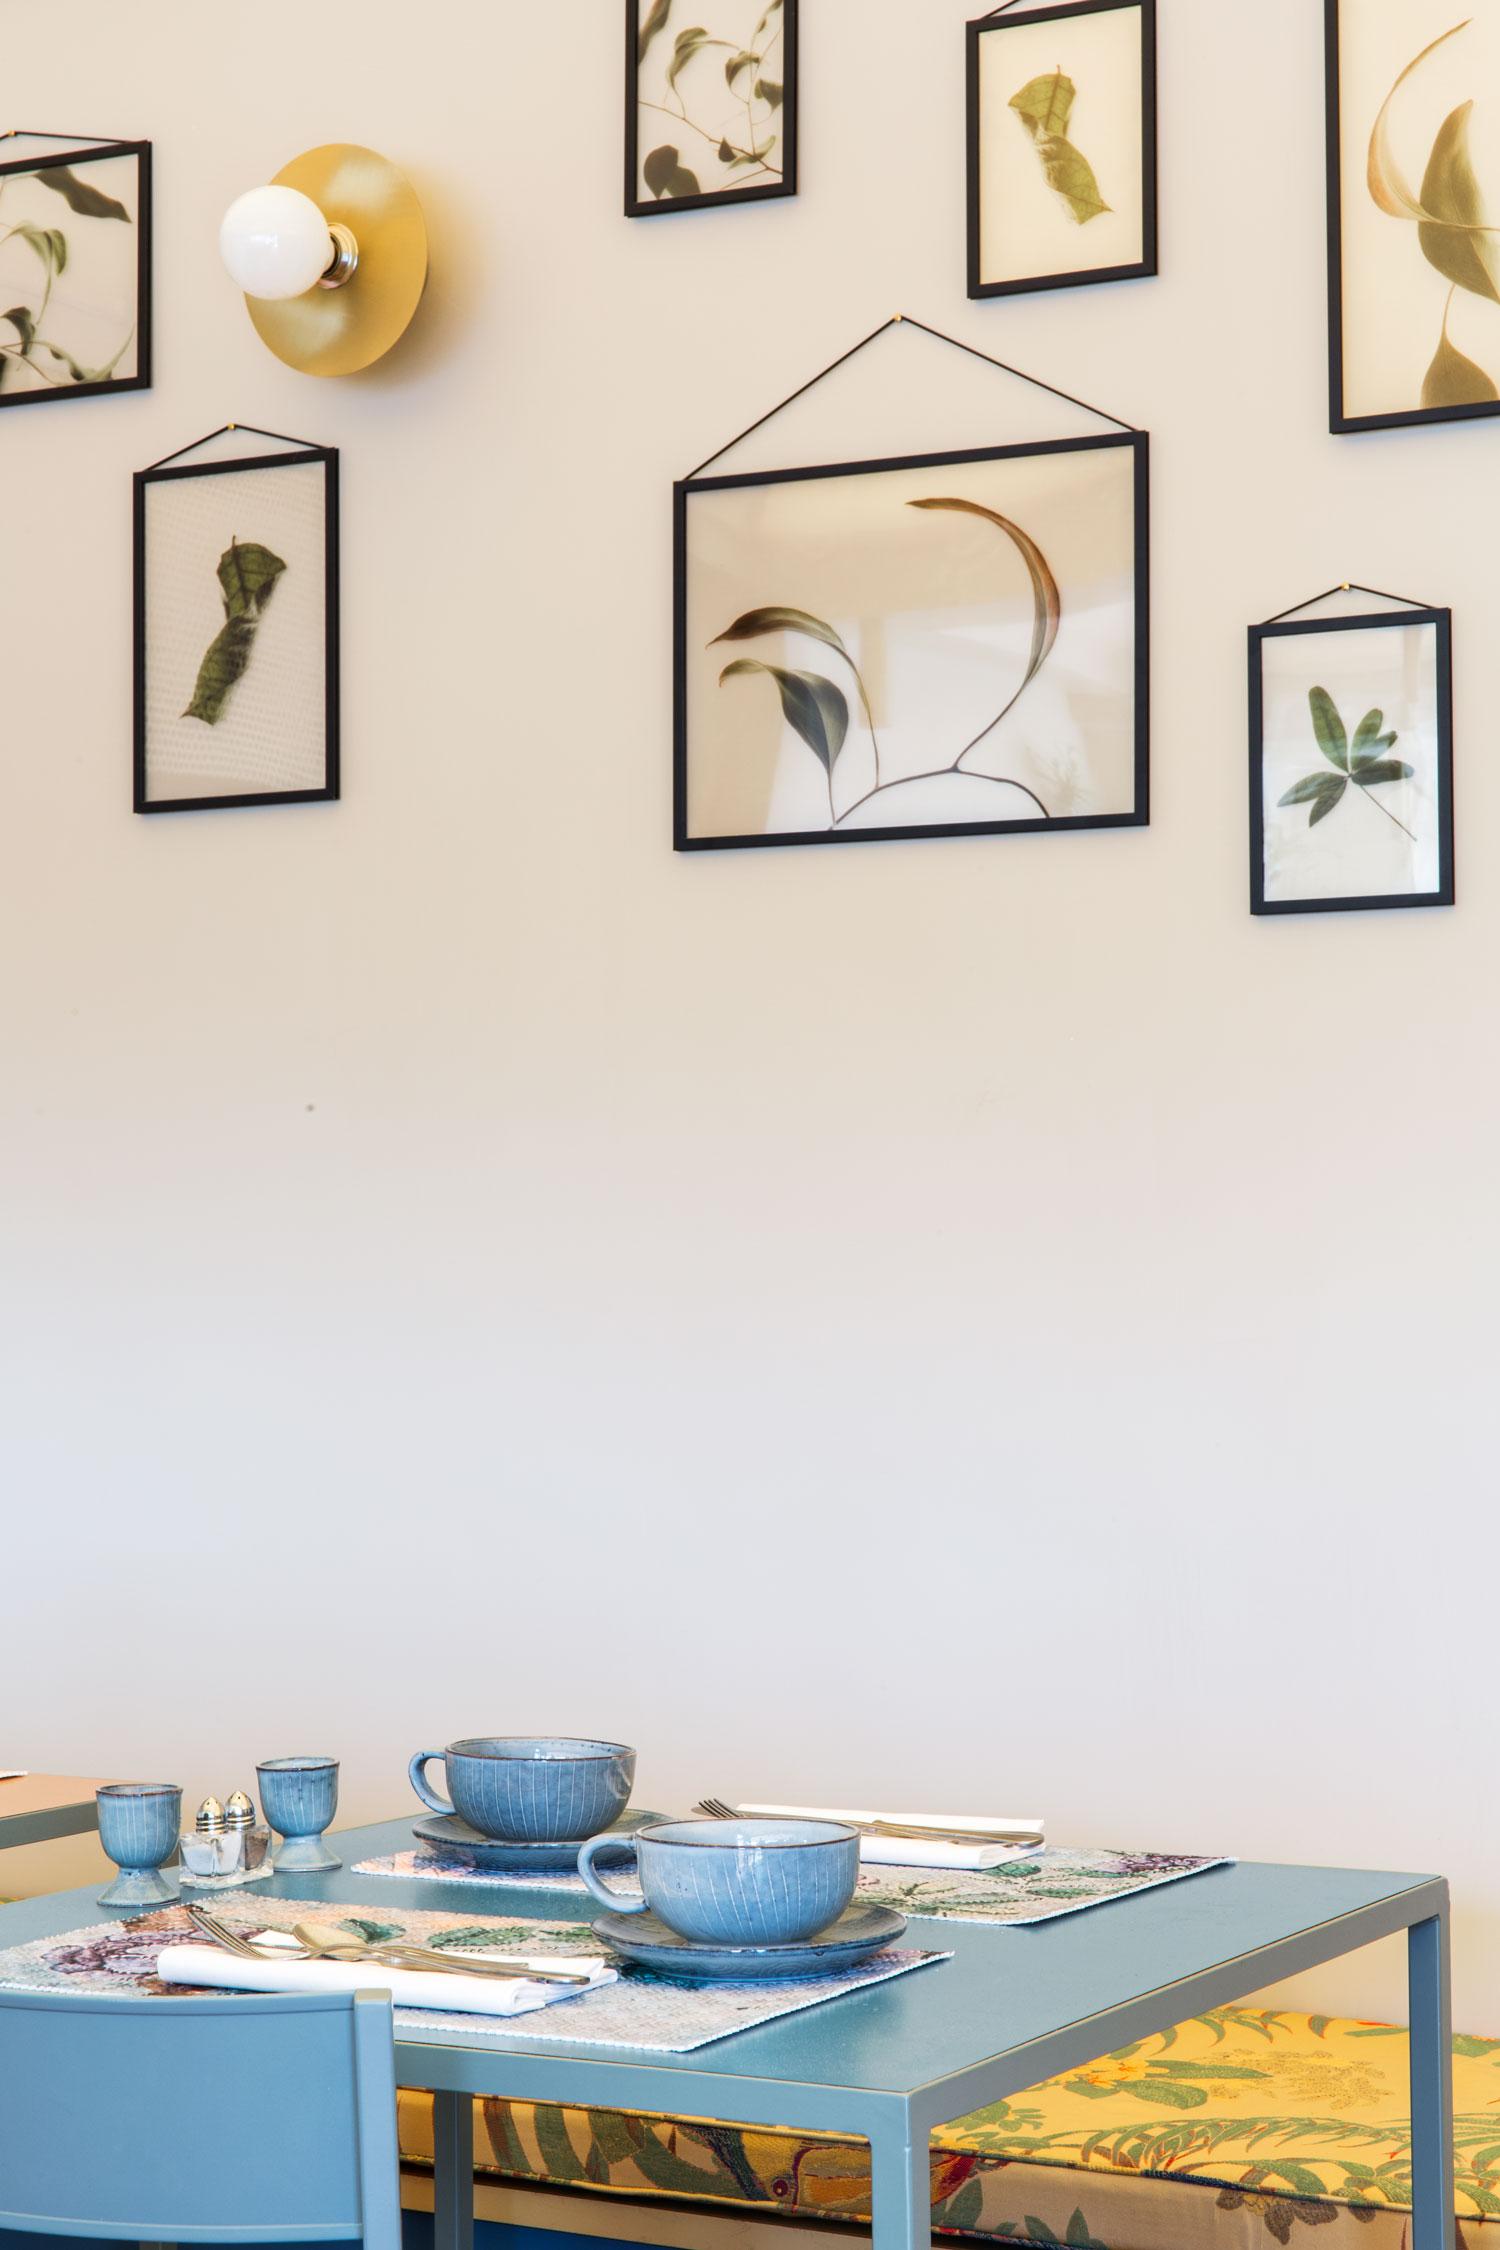 Redefining Hospitality Design With This Vibrant Hotel In Rome - WWW.AUTHENTICINTERIOR.COM design studio & blog